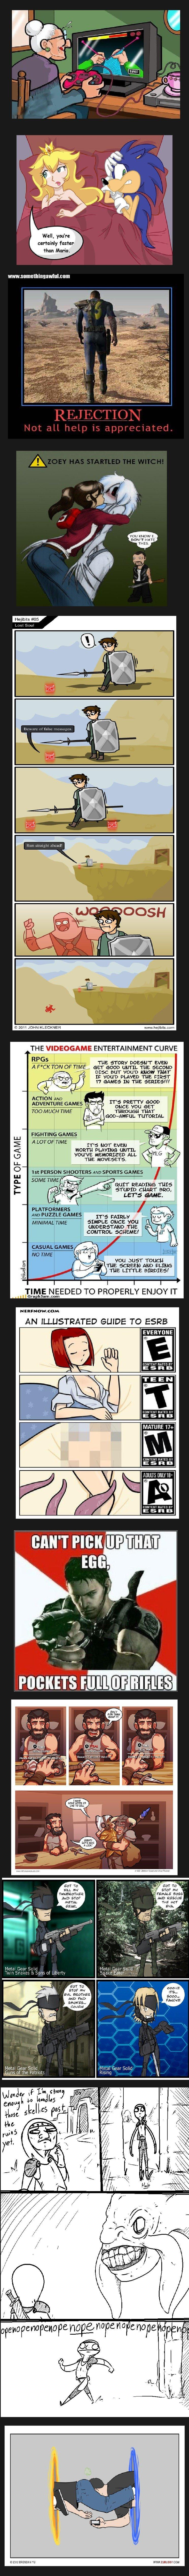 Gaming comp 8. .